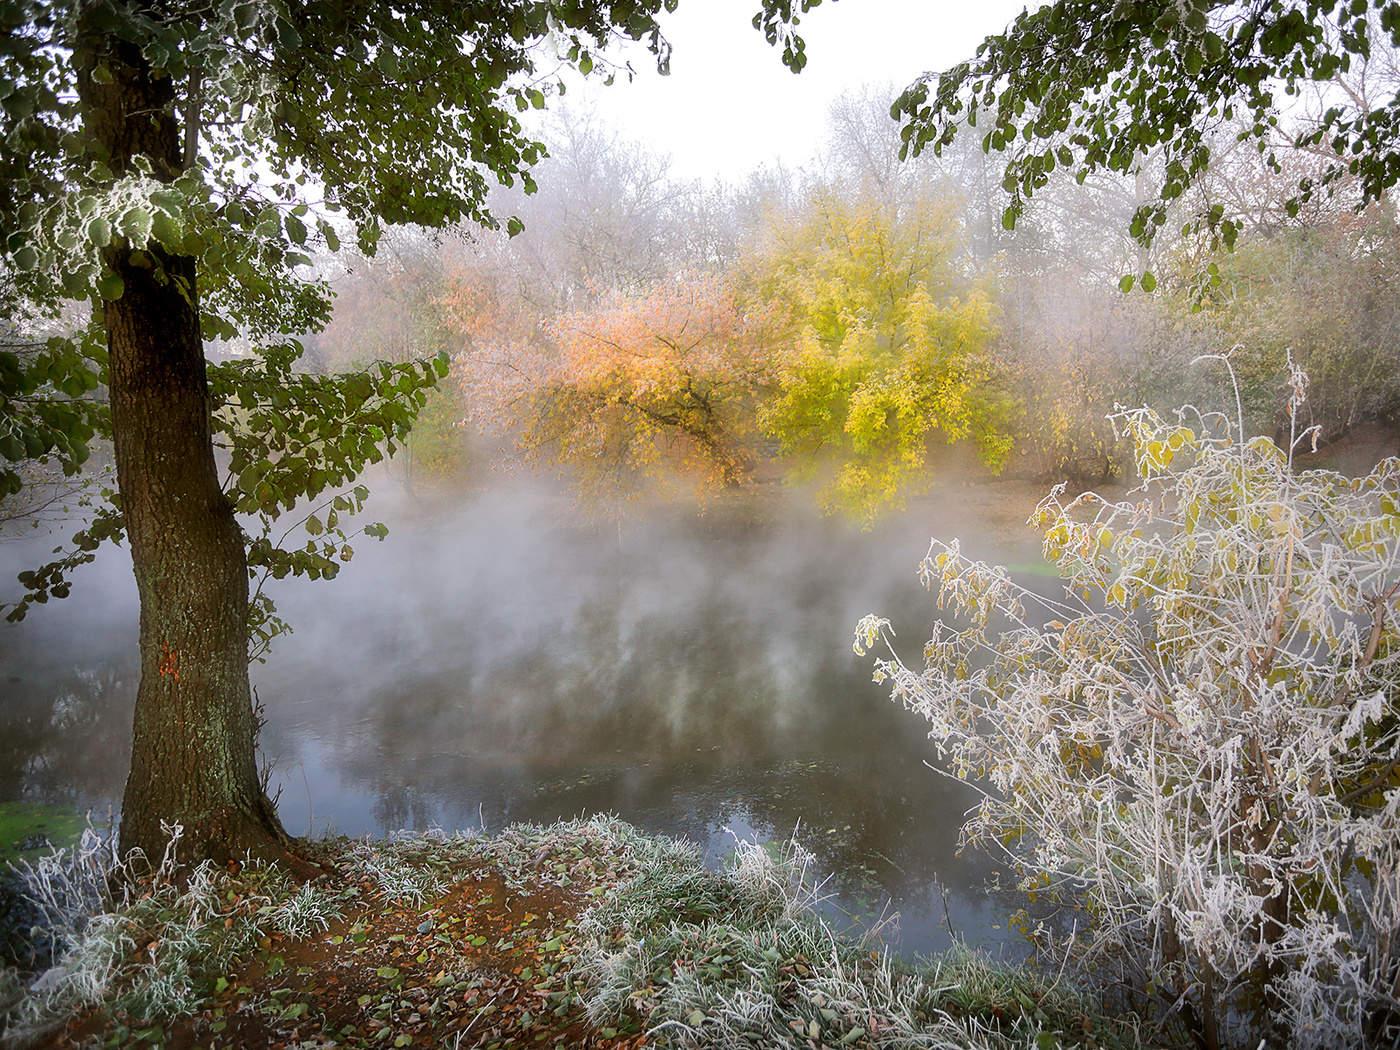 Картинки туман для календаря природы